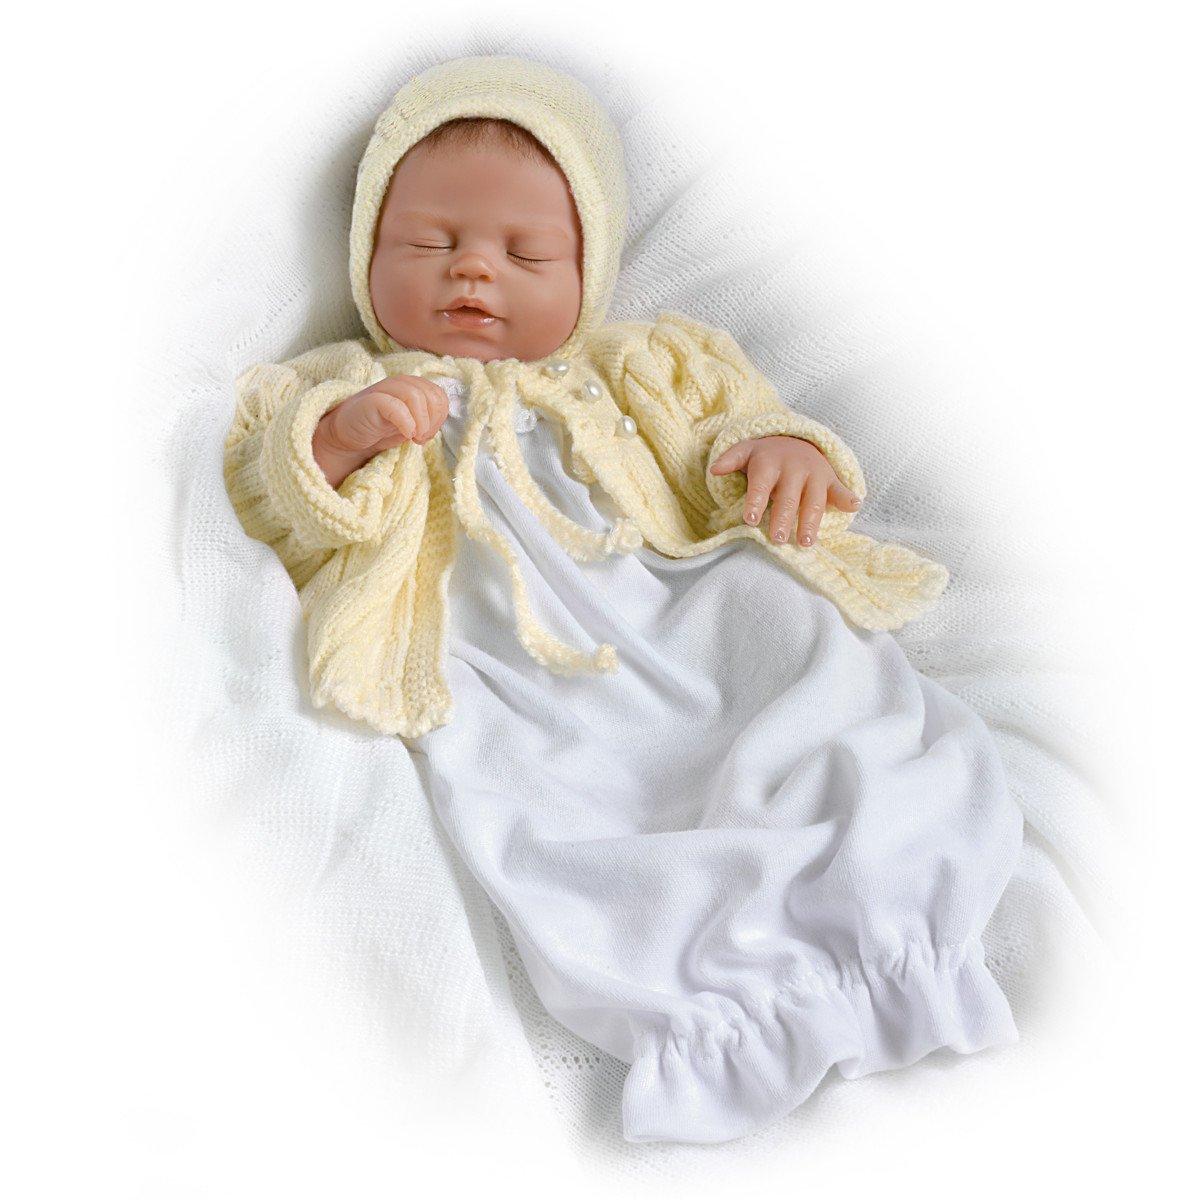 Ashton drake princess charlotte of cambridge baby doll for The ashton